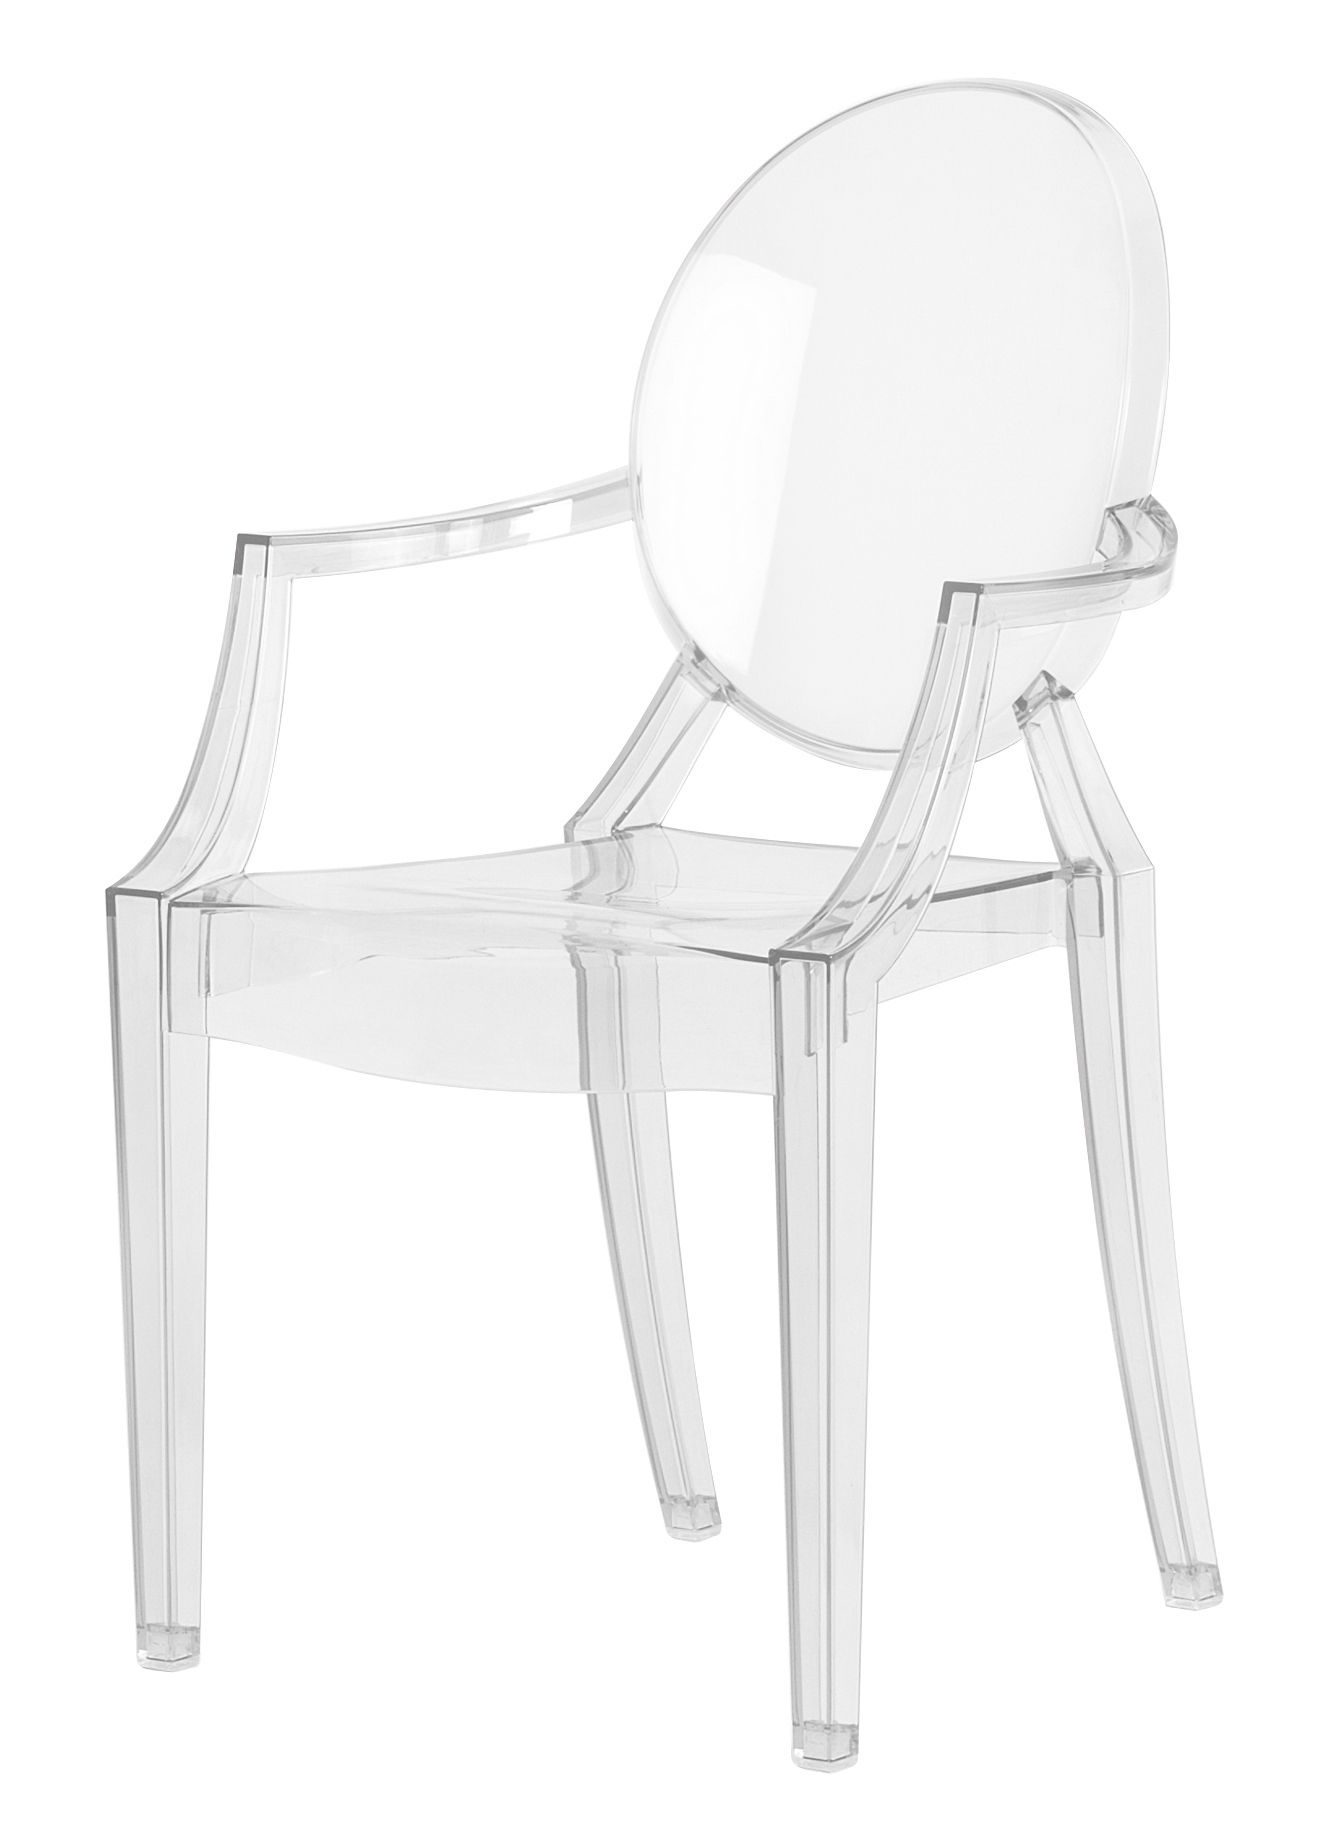 Arredamento - Mobili per bambini - Poltrona bambini Lou Lou Ghost di Kartell - Trasparente - policarbonato